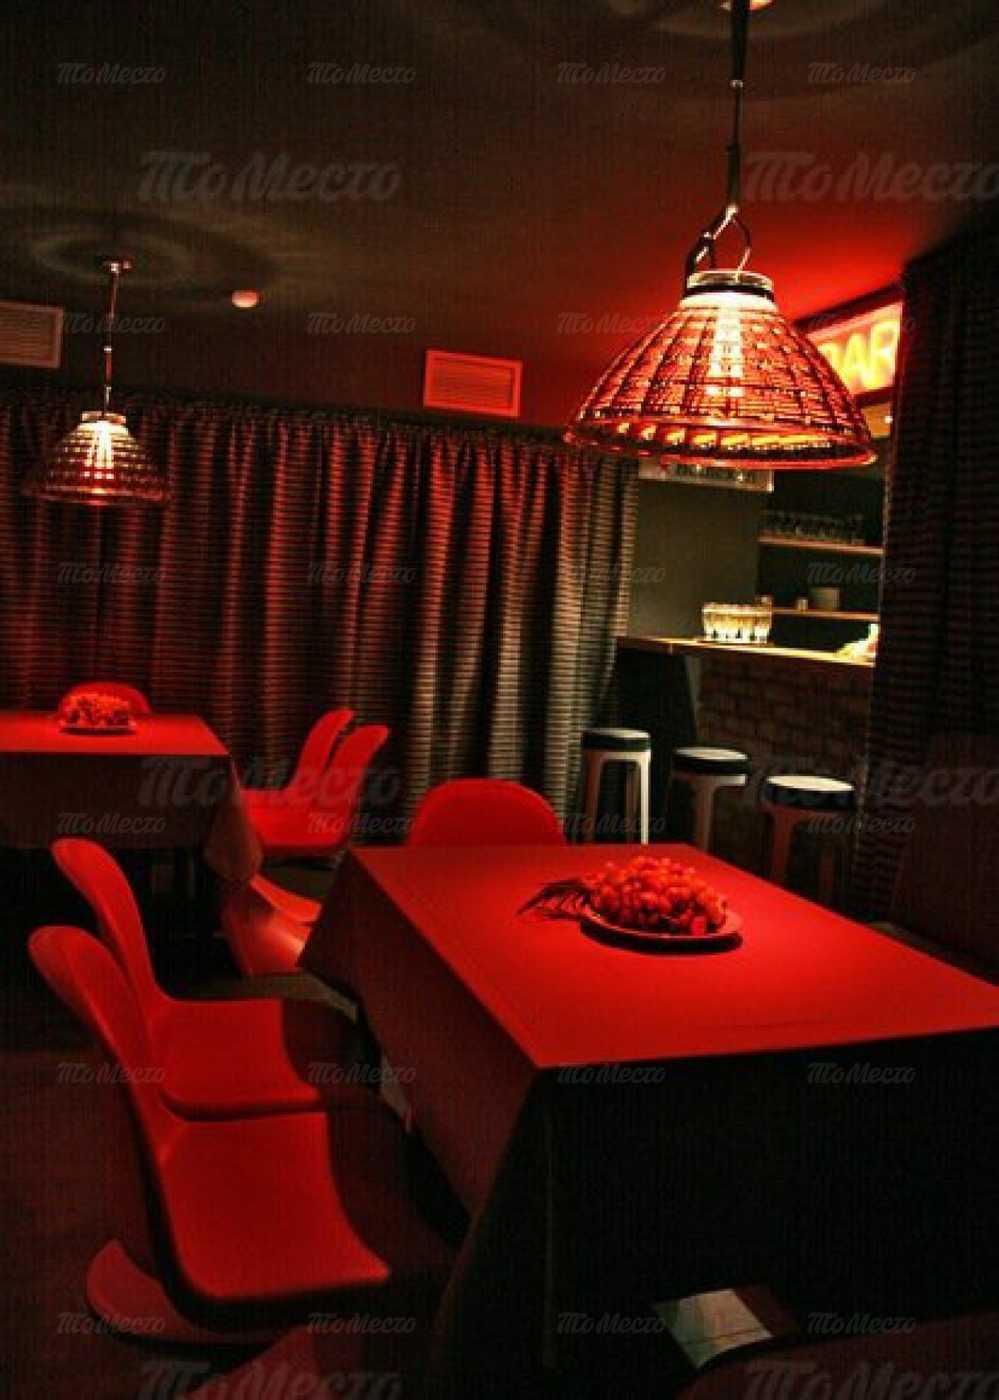 Ресторан, стейк-хаус Коровабар (Korovabar) на Караванной улице фото 3